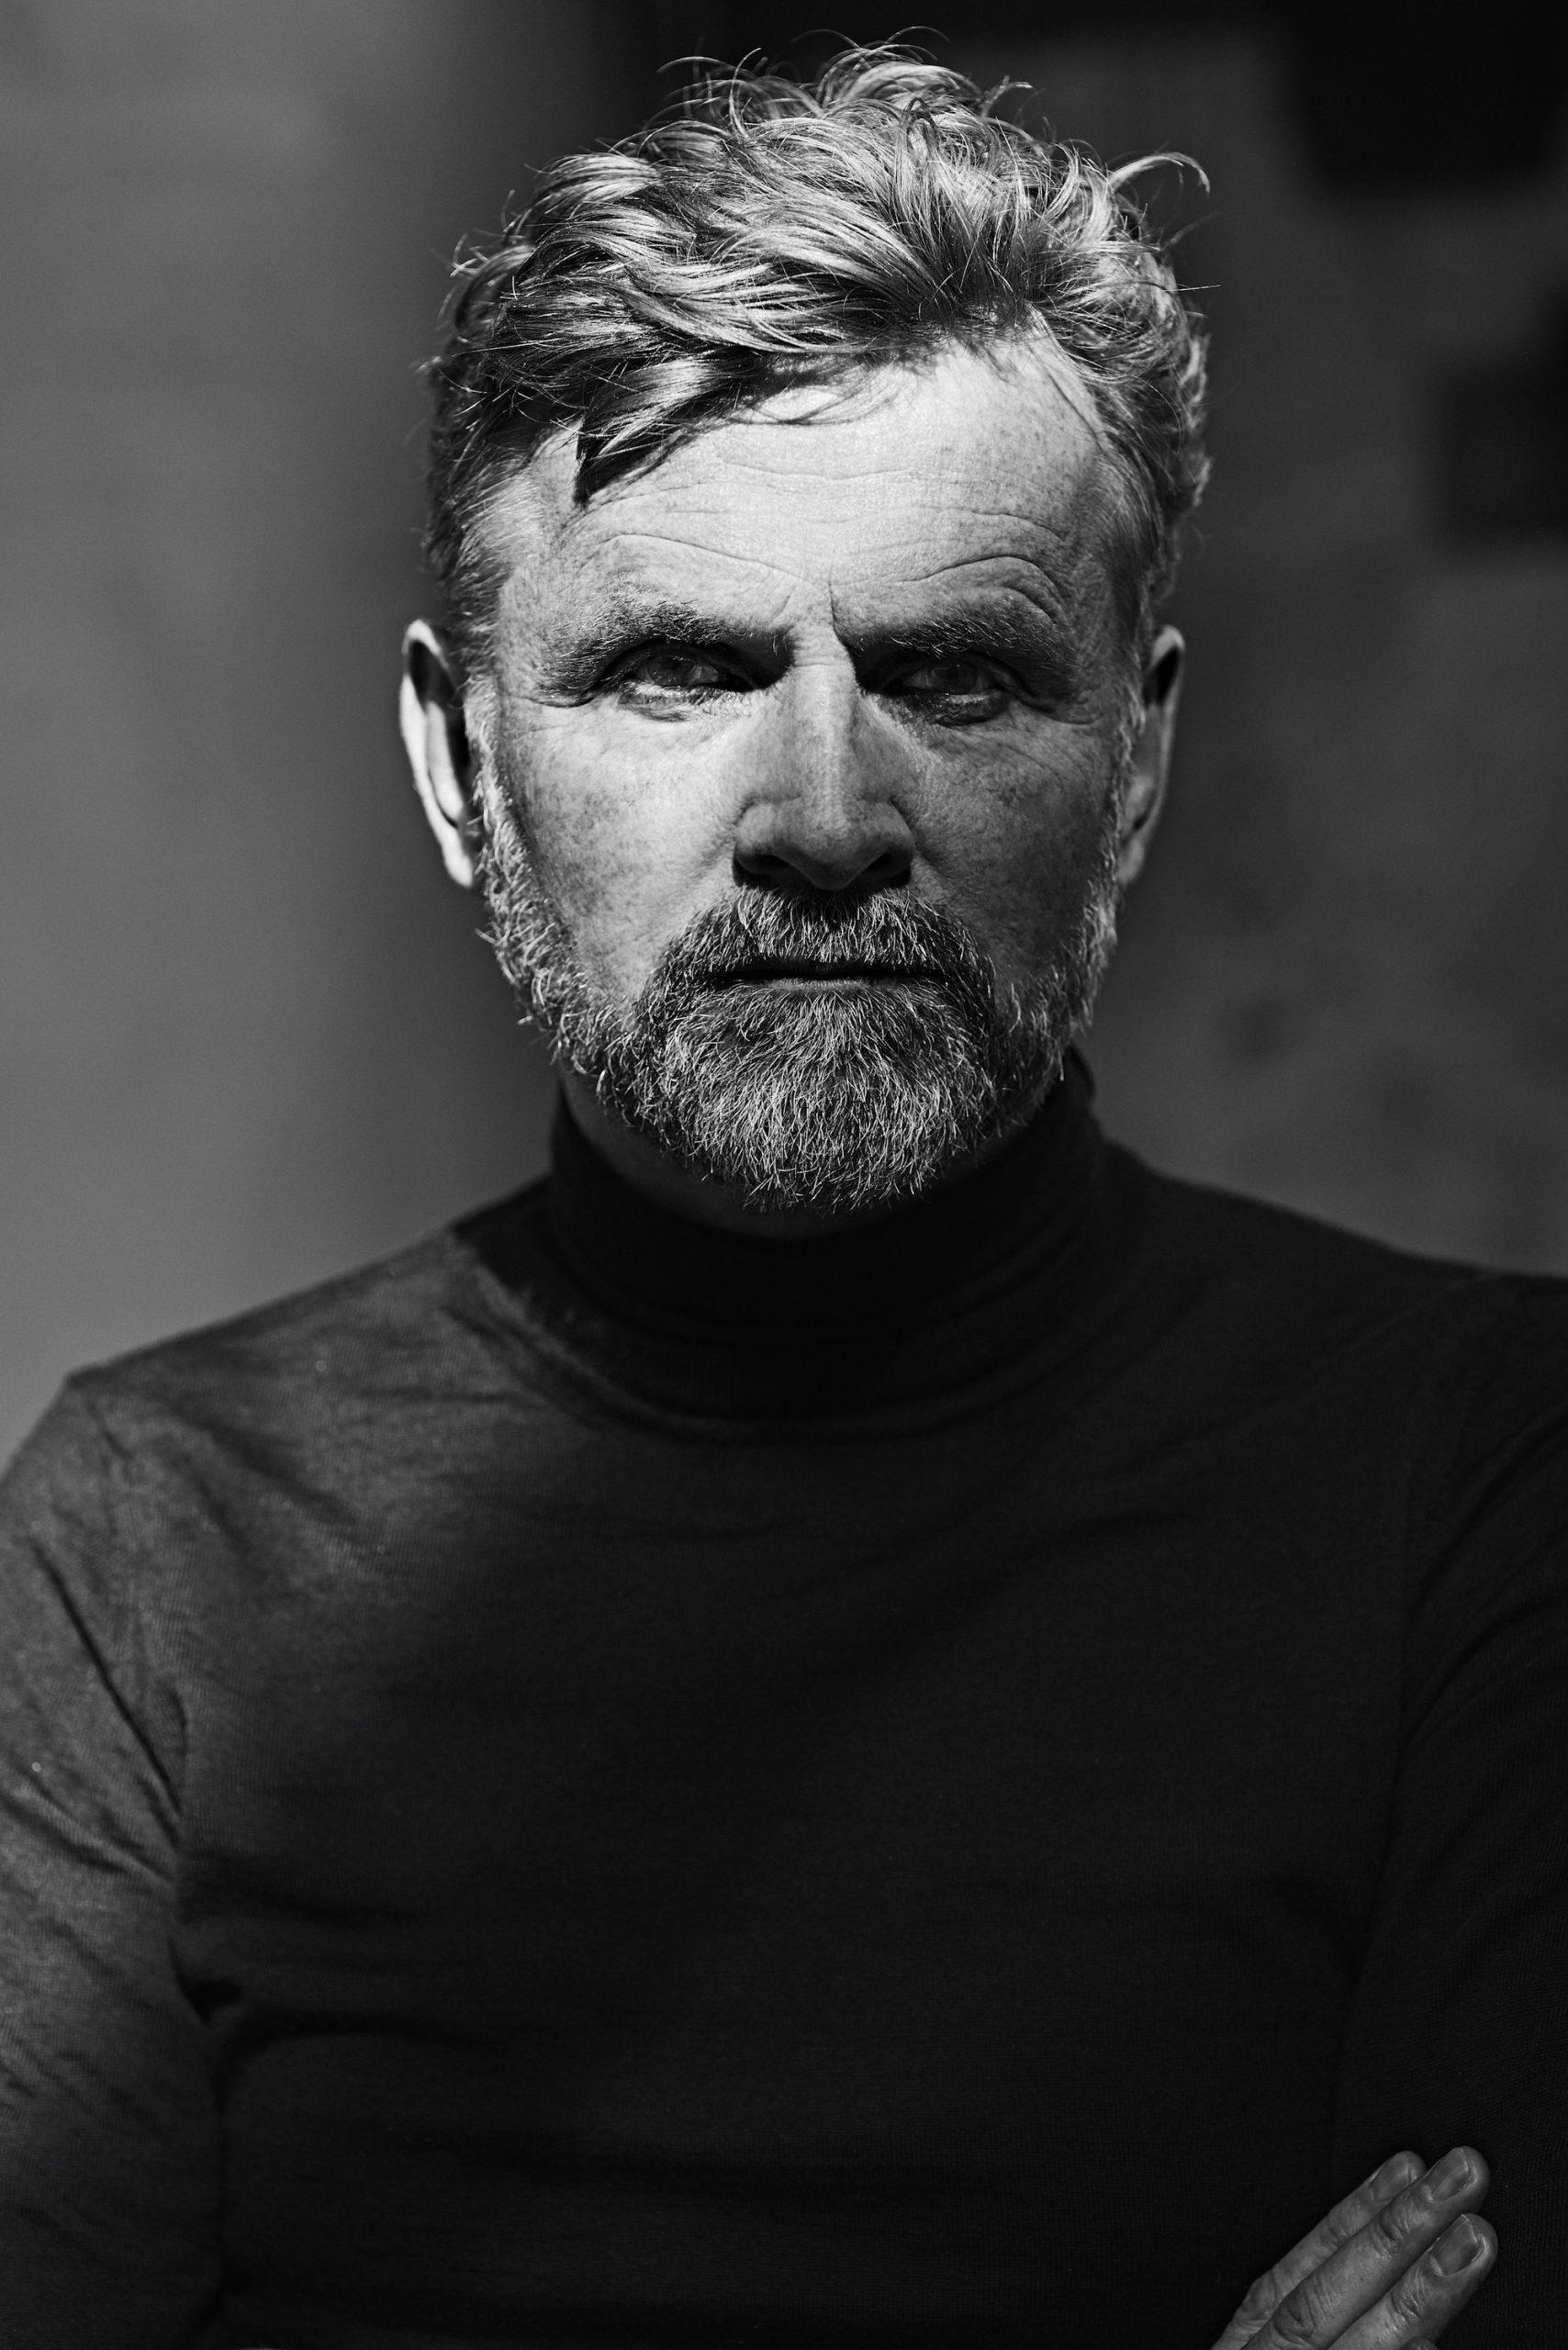 René van Zinnicq Bergmann